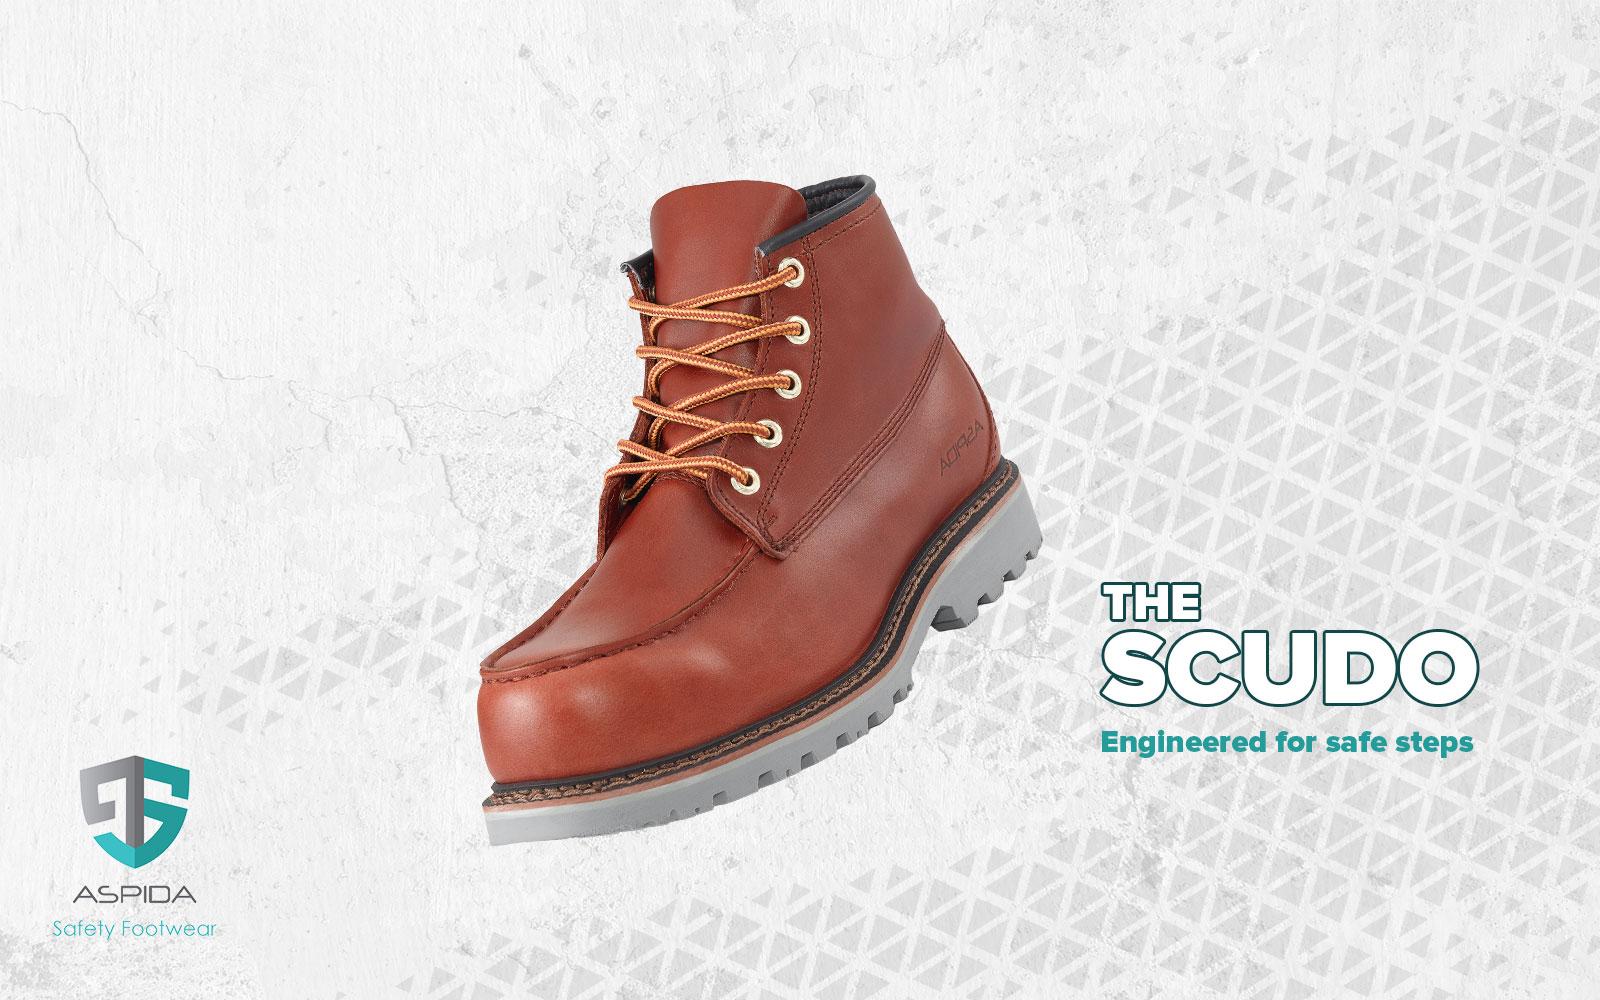 Branding Malaysia - Aspida Footwear Key Image min - Oblique